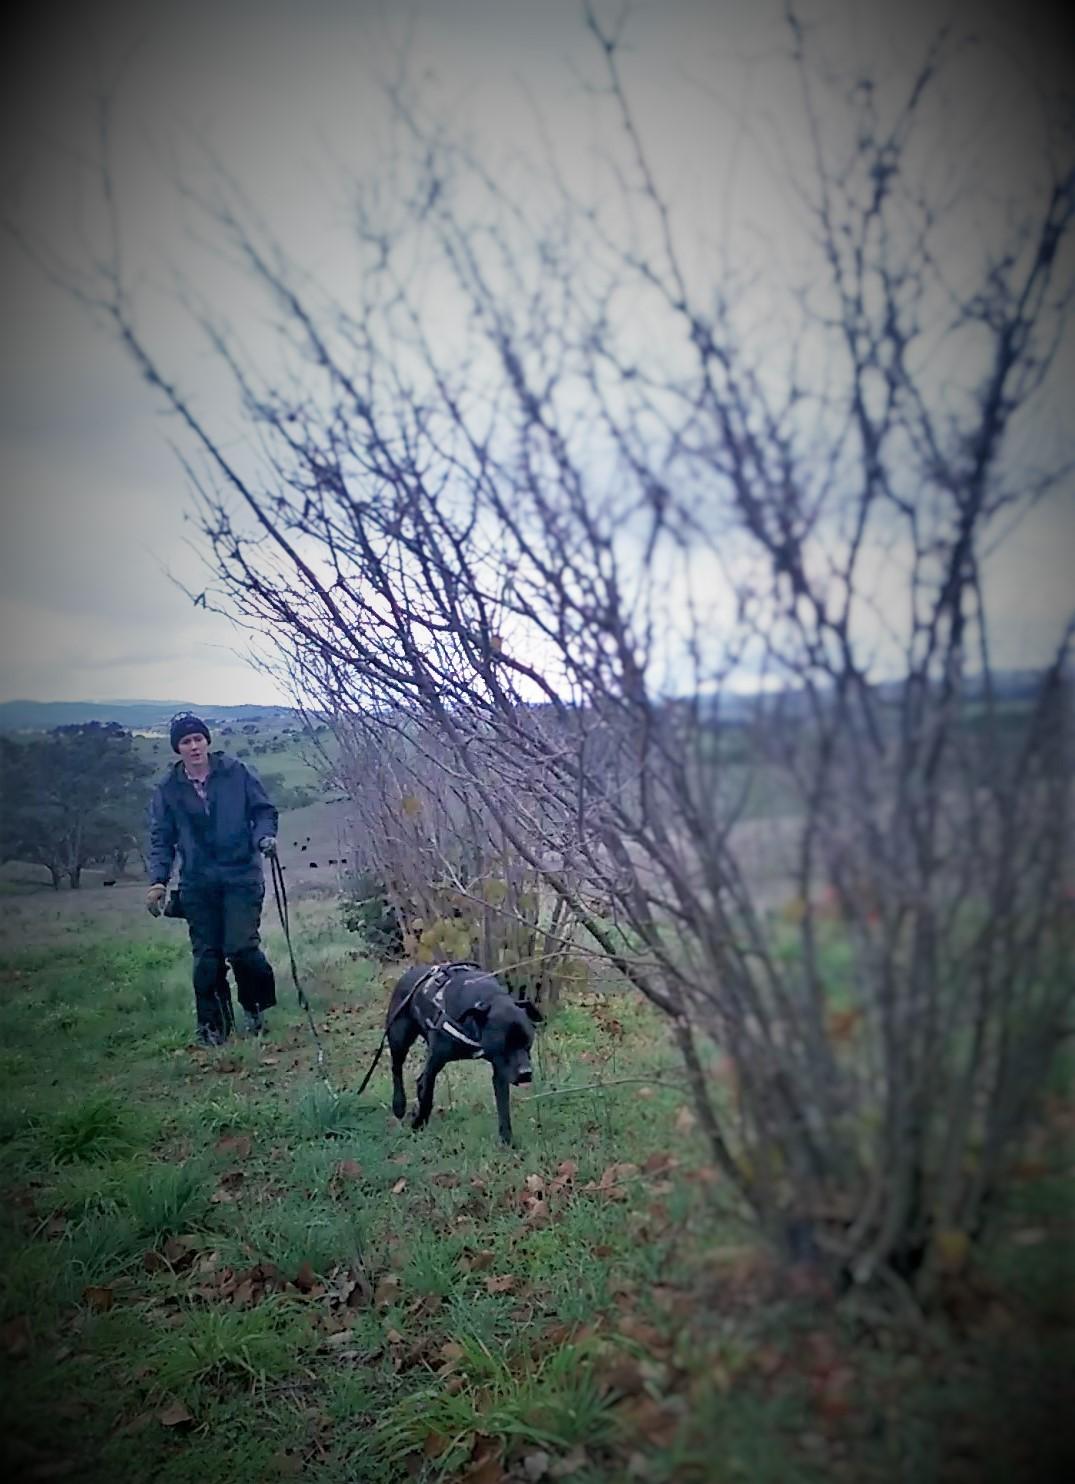 The truffle hunt.